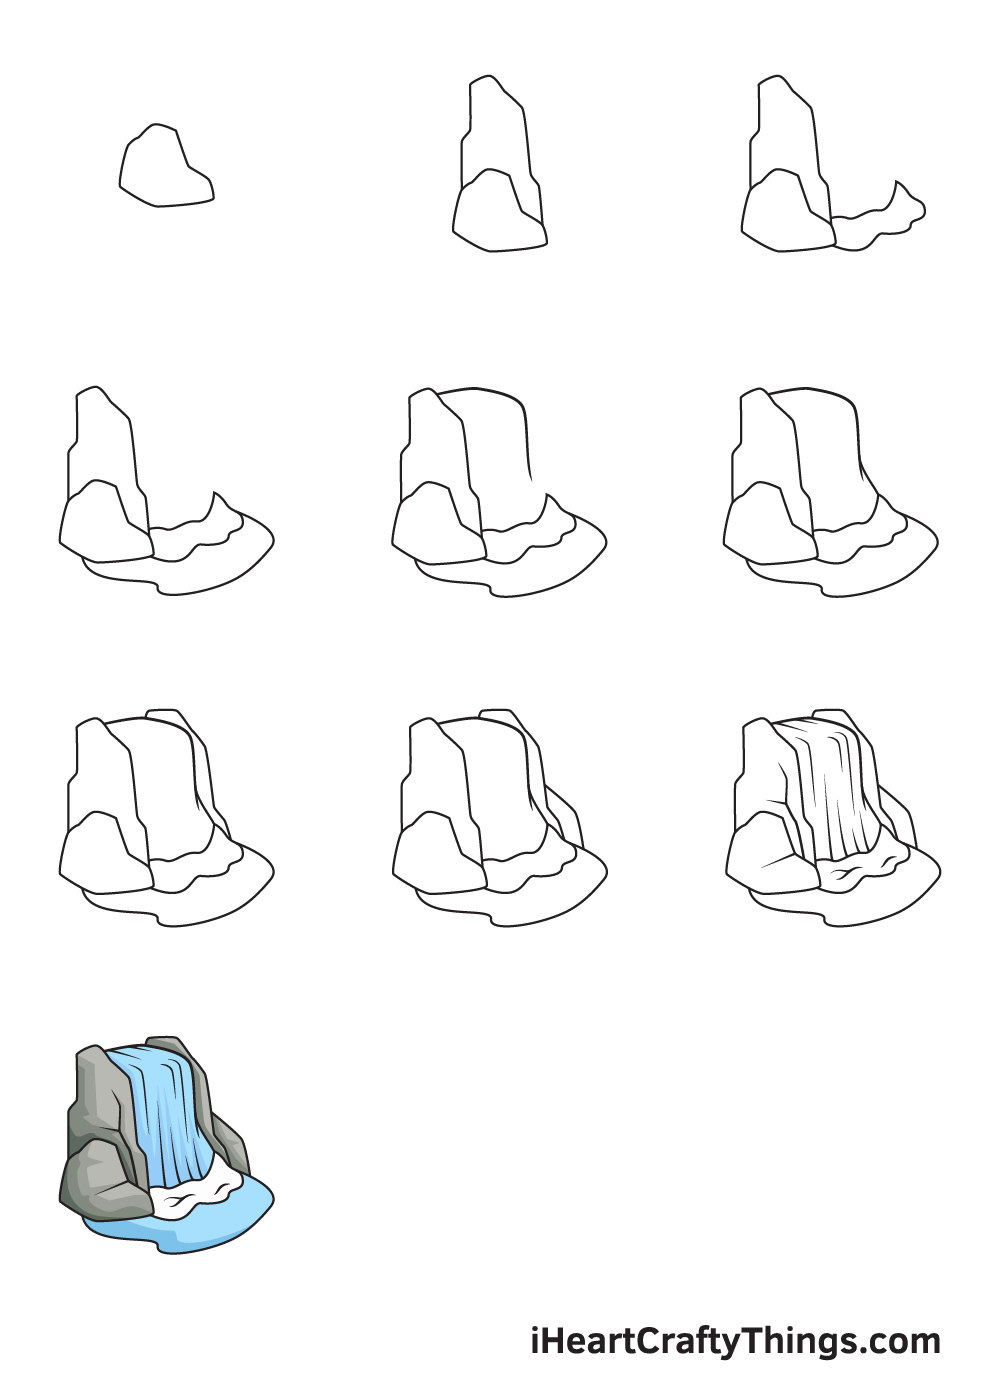 drawing waterfall in 9 steps